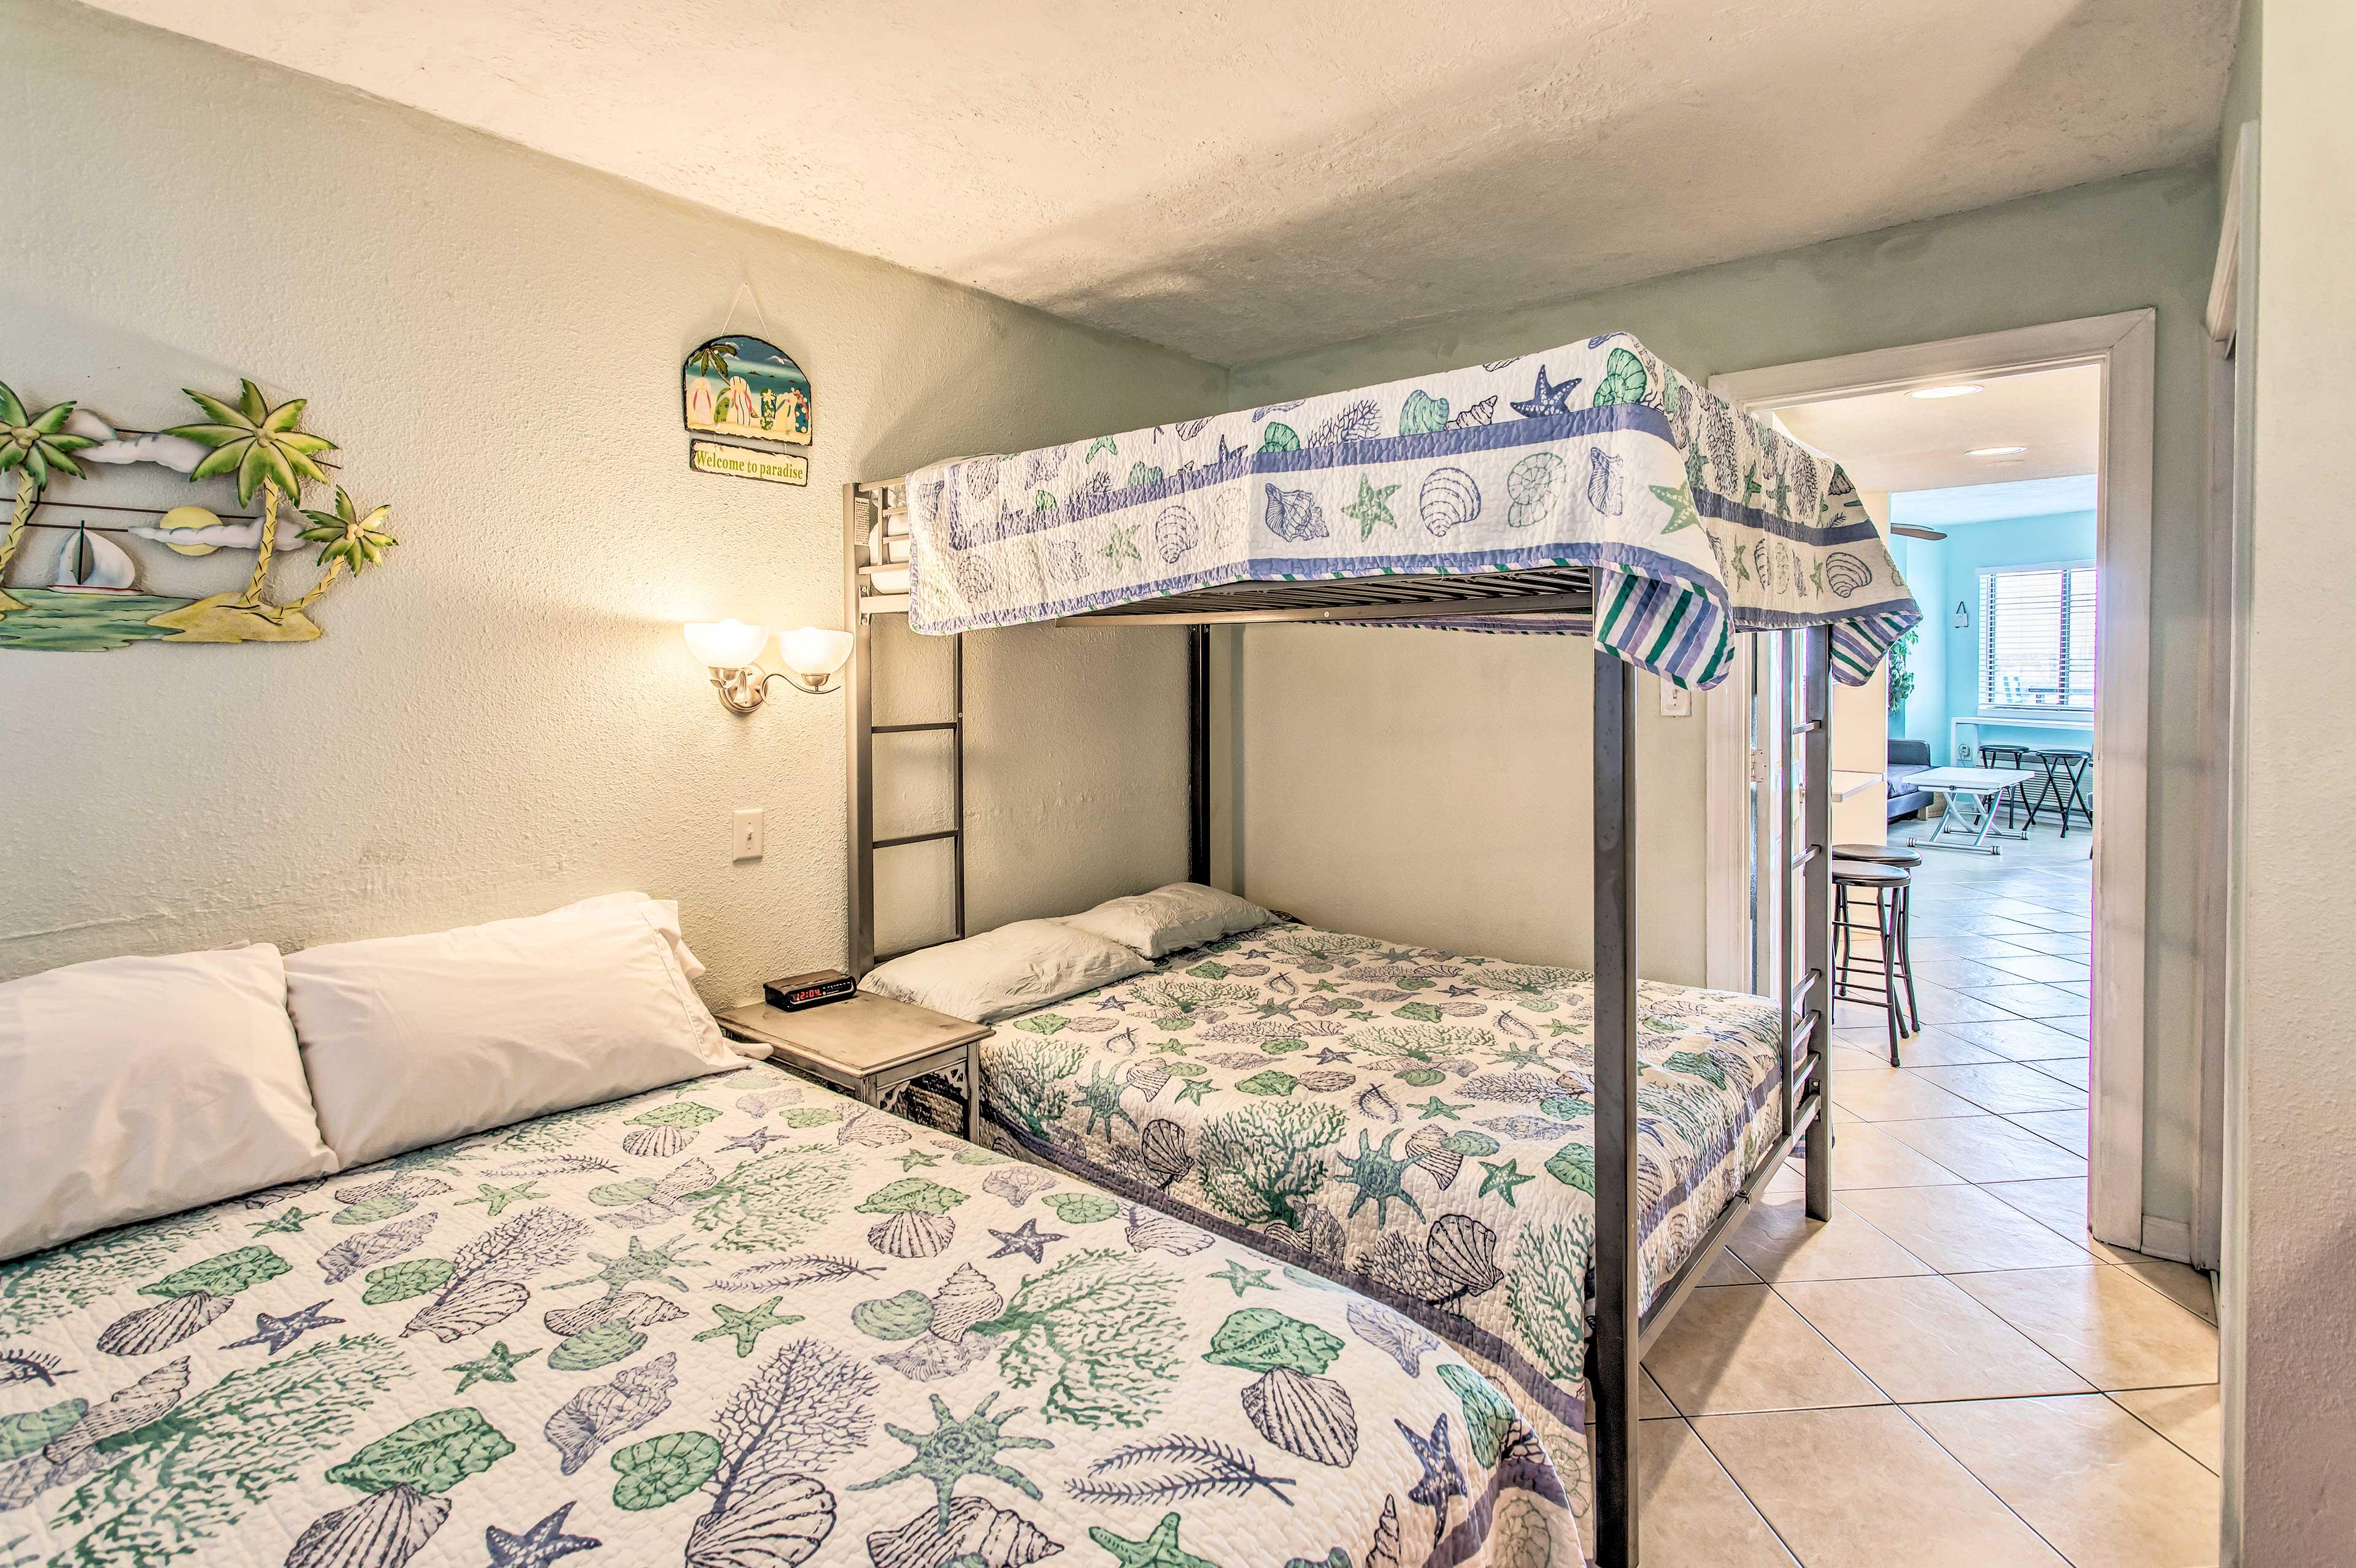 Bedroom | Queen Bed | Full Bunk Bed | Linens Provided